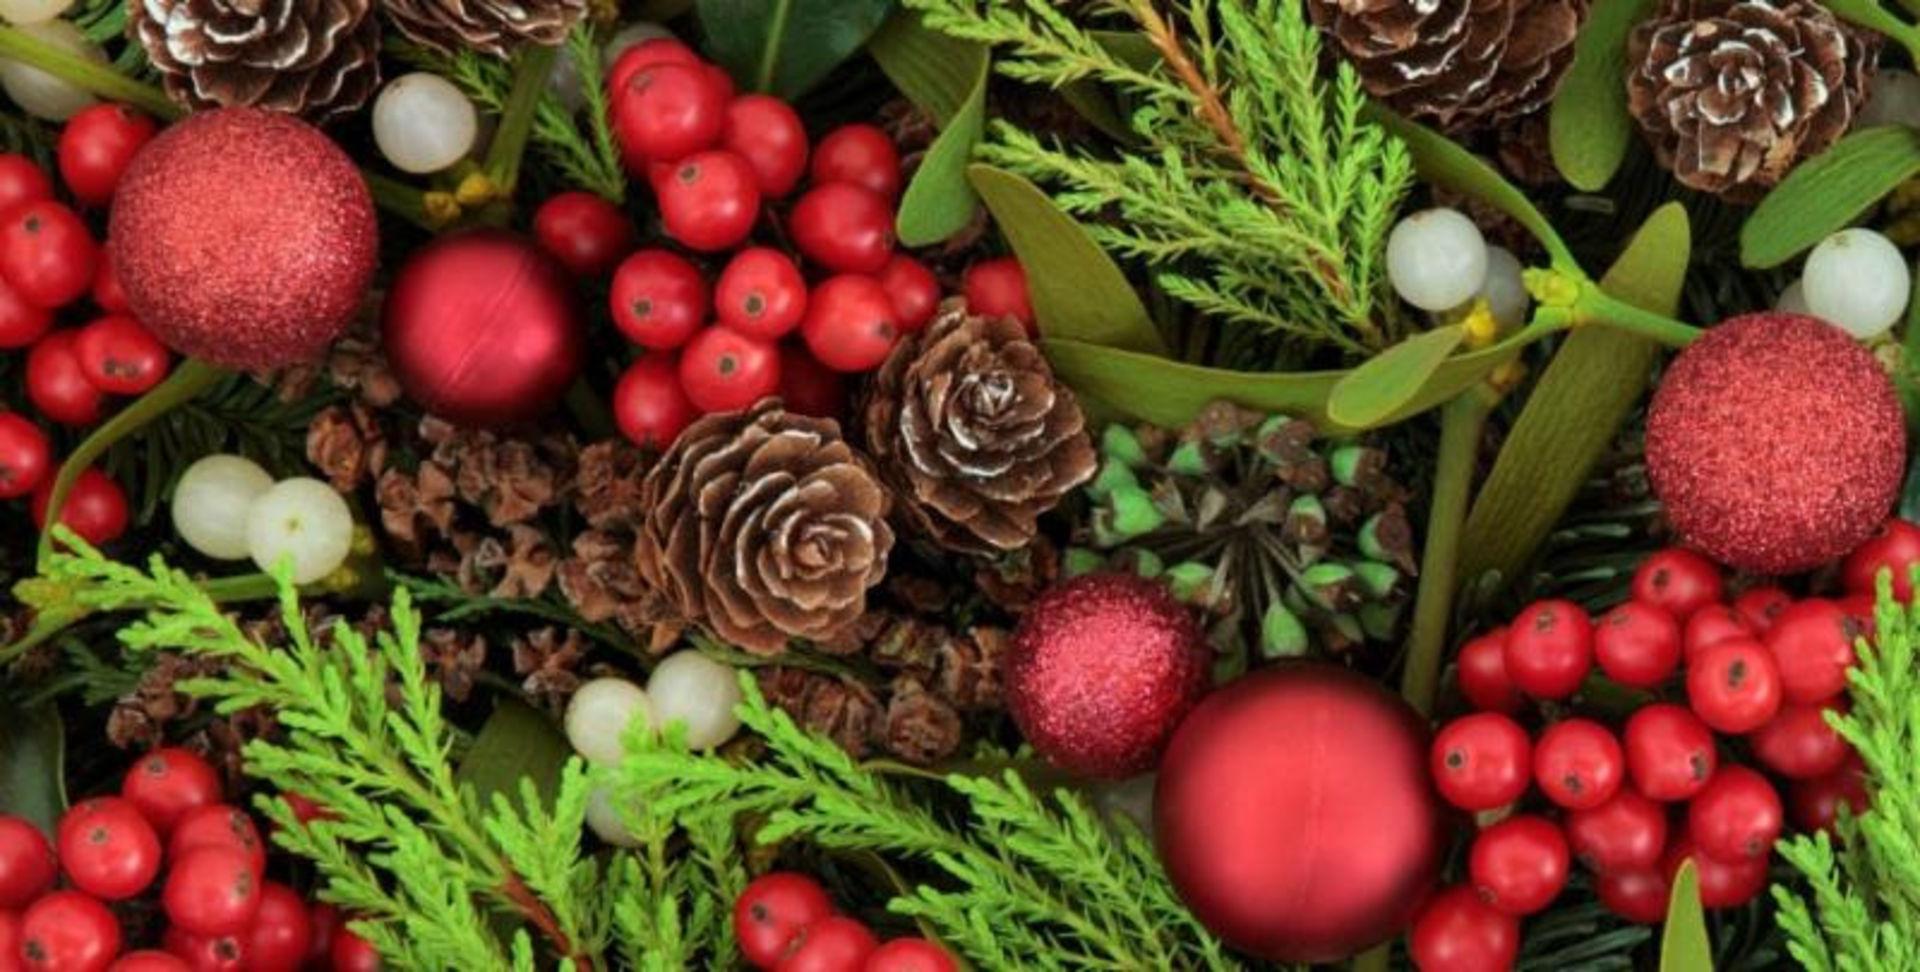 December Events in Atlanta